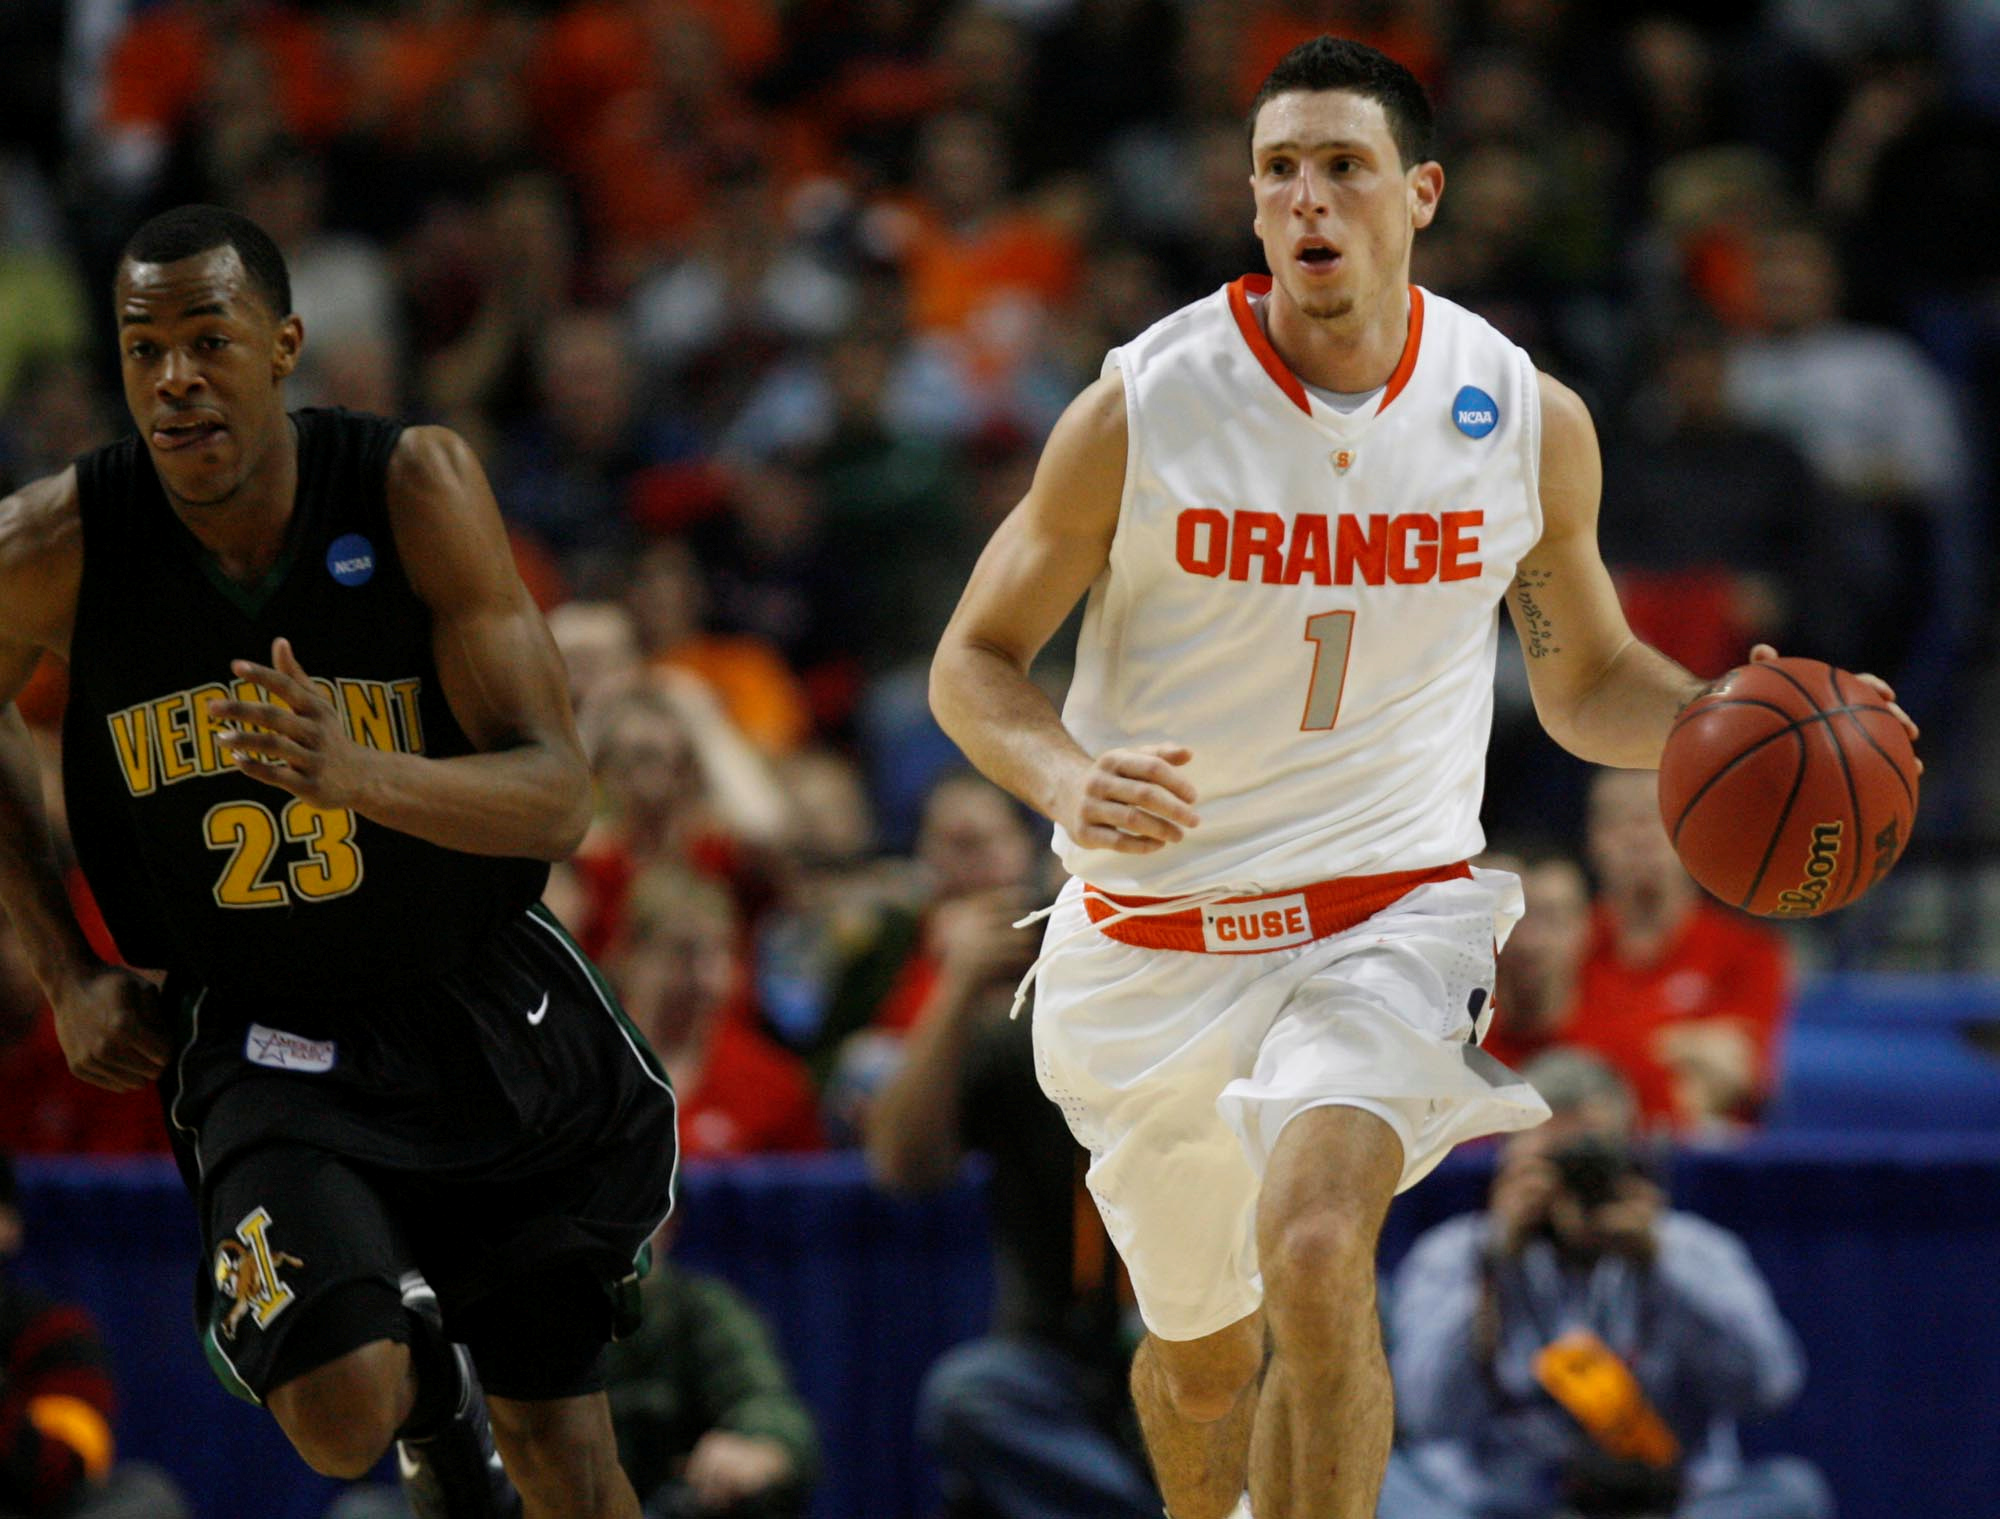 Andy Rautins powers Syracuse up the floor. (John Hickey/Buffalo News)